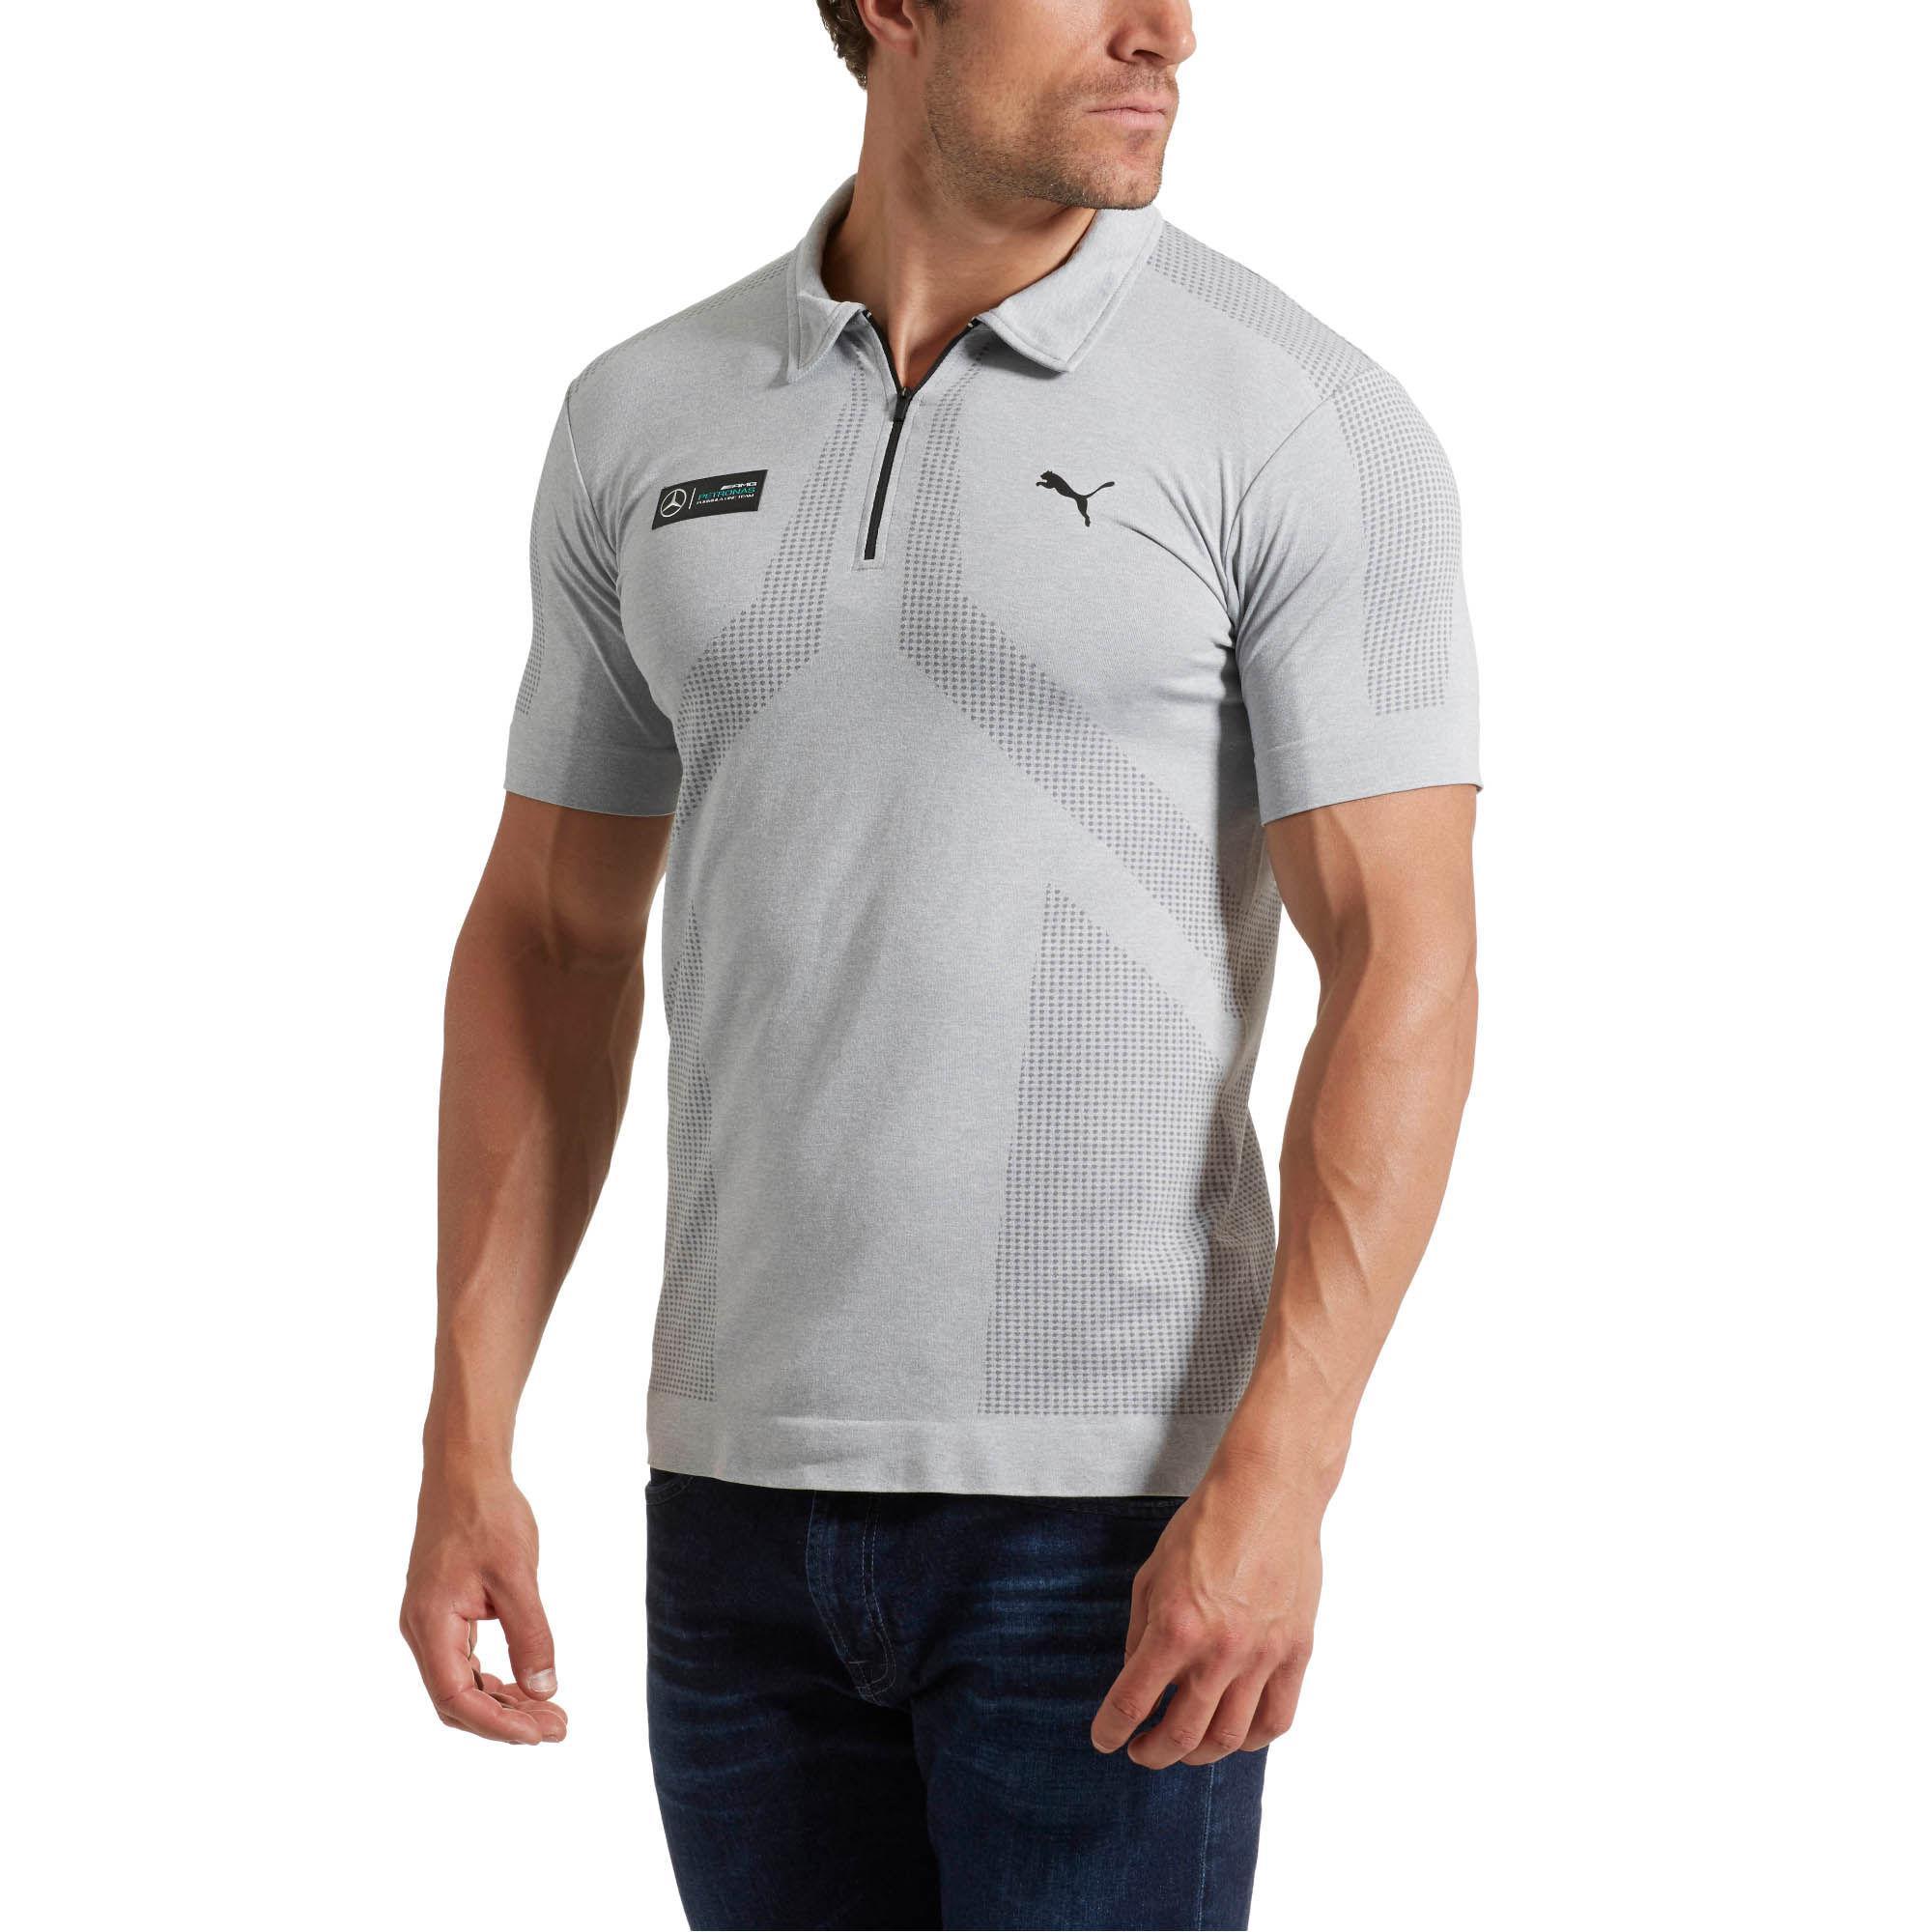 6cba97eb0 PUMA Mercedes Amg Petronas Evoknit Polo in Gray for Men - Lyst